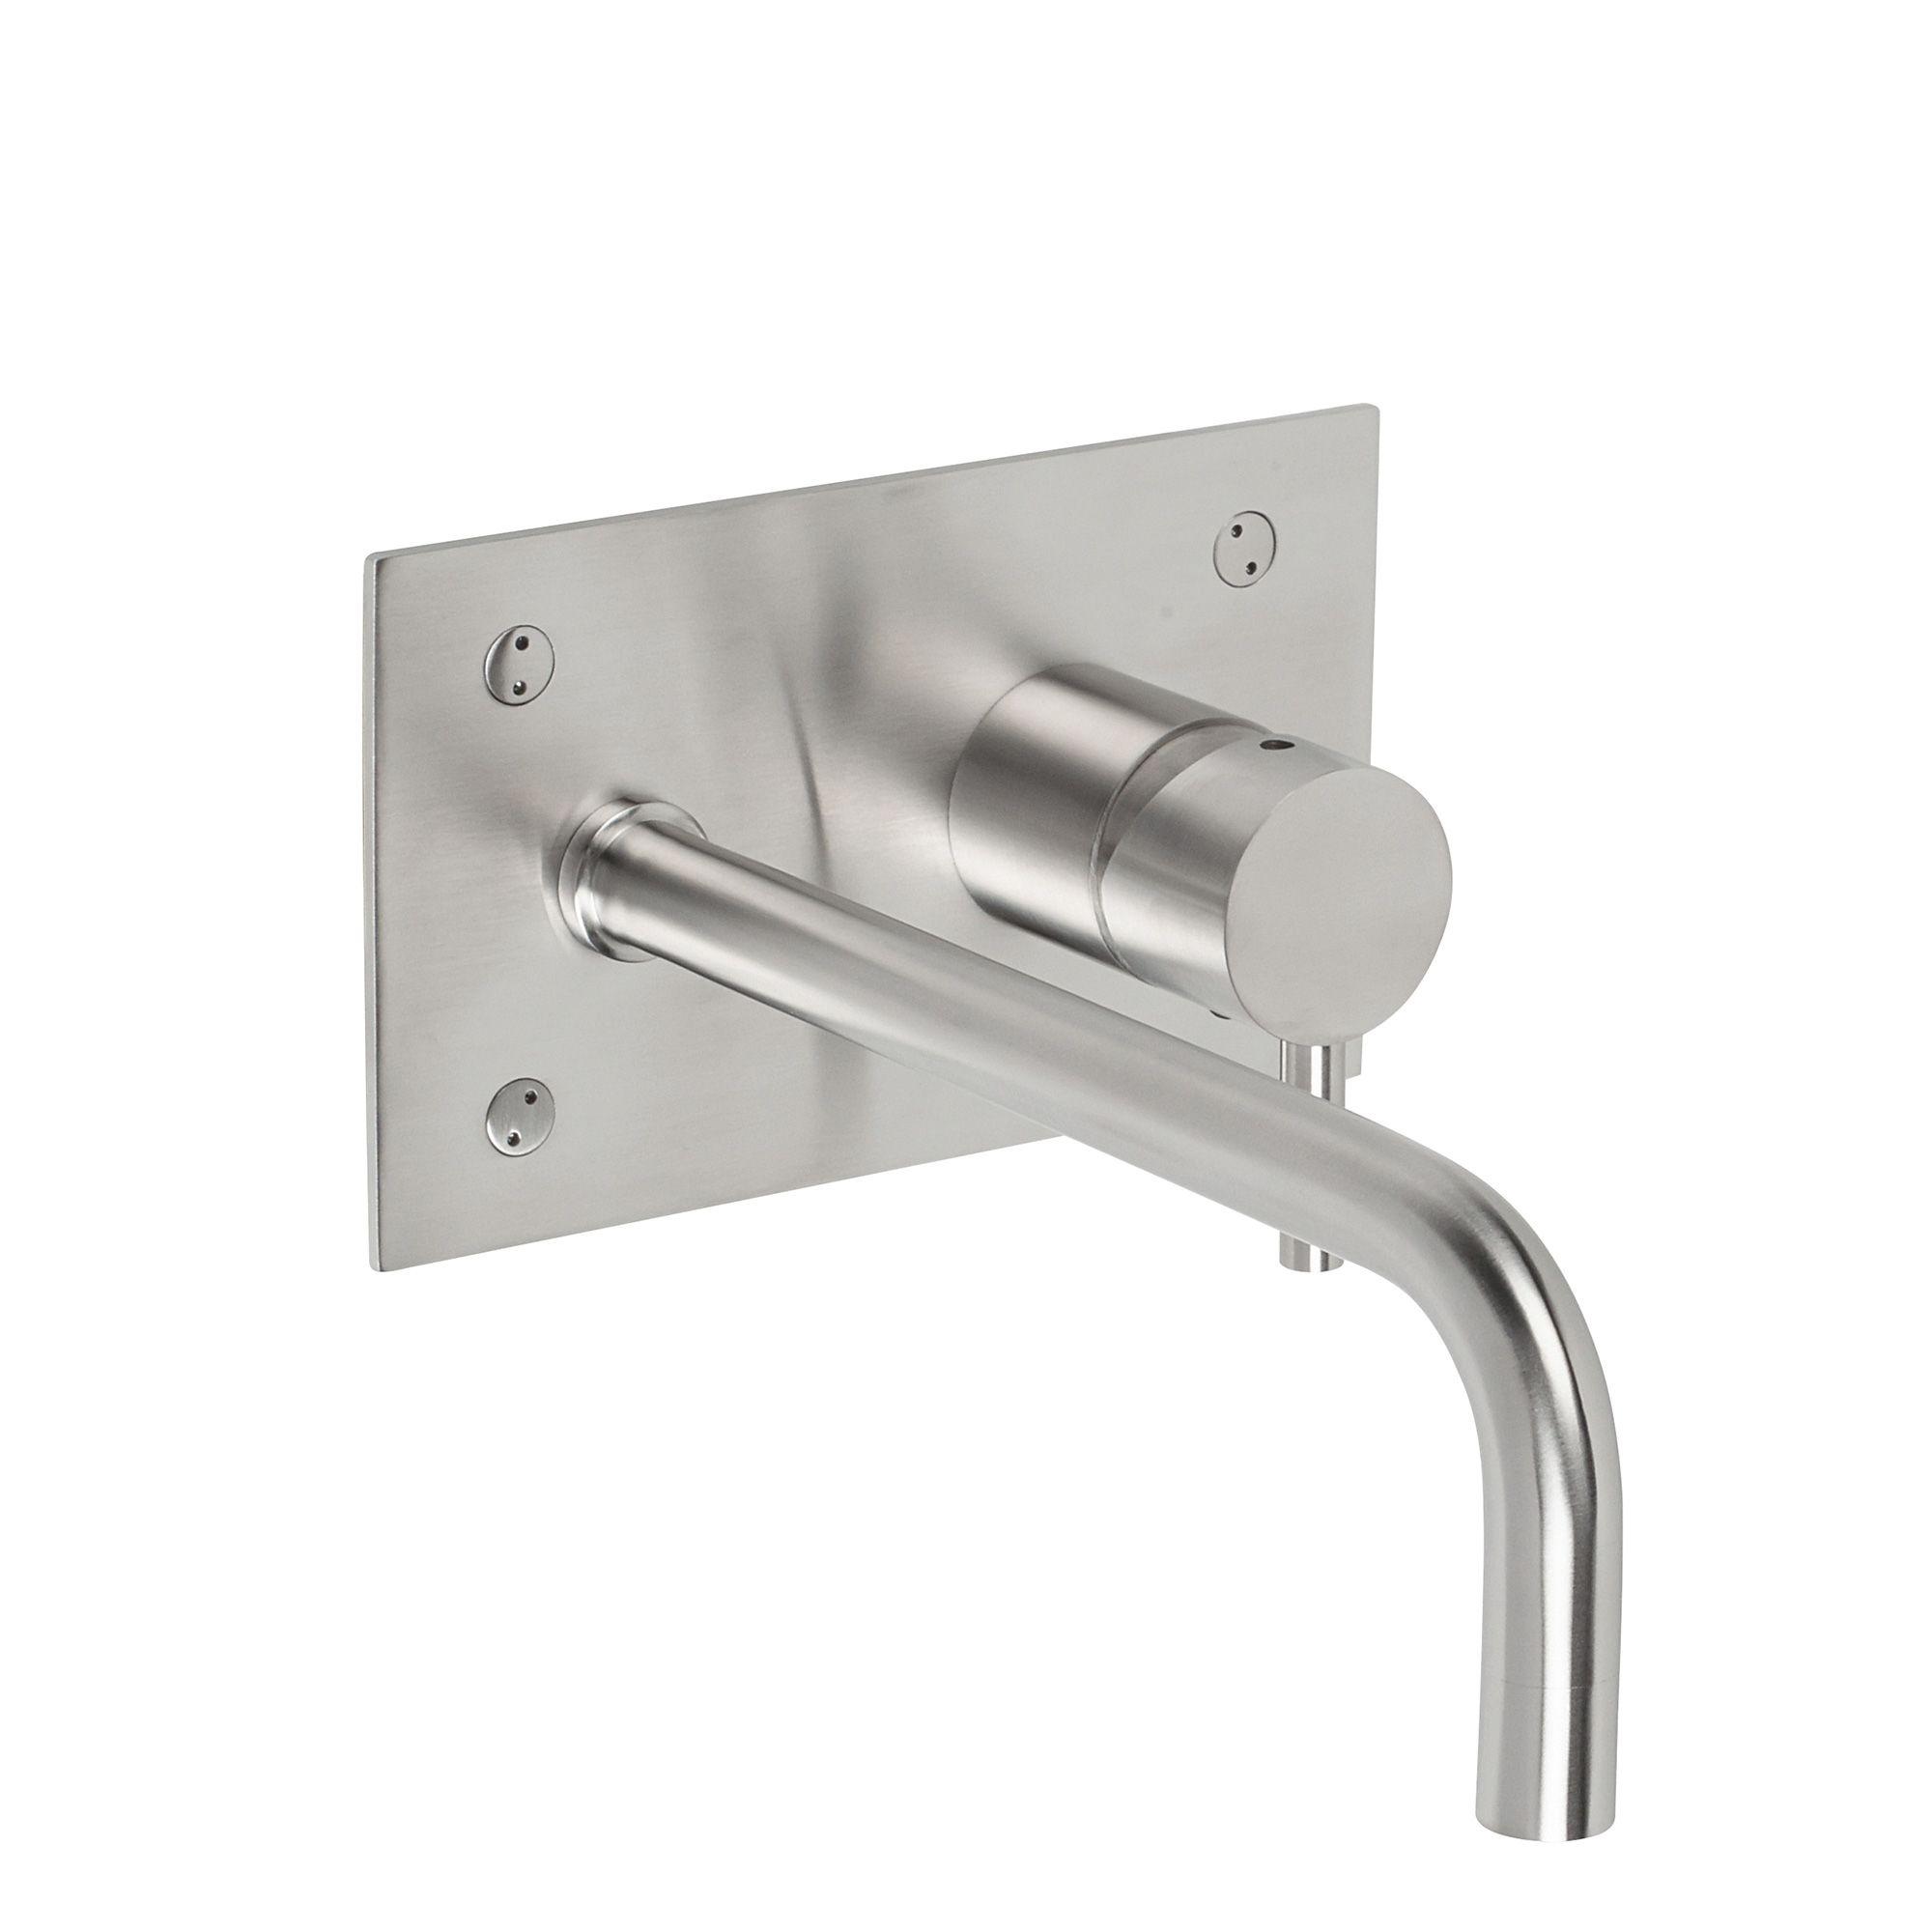 Hudson Wall mounted single lever basin mixer